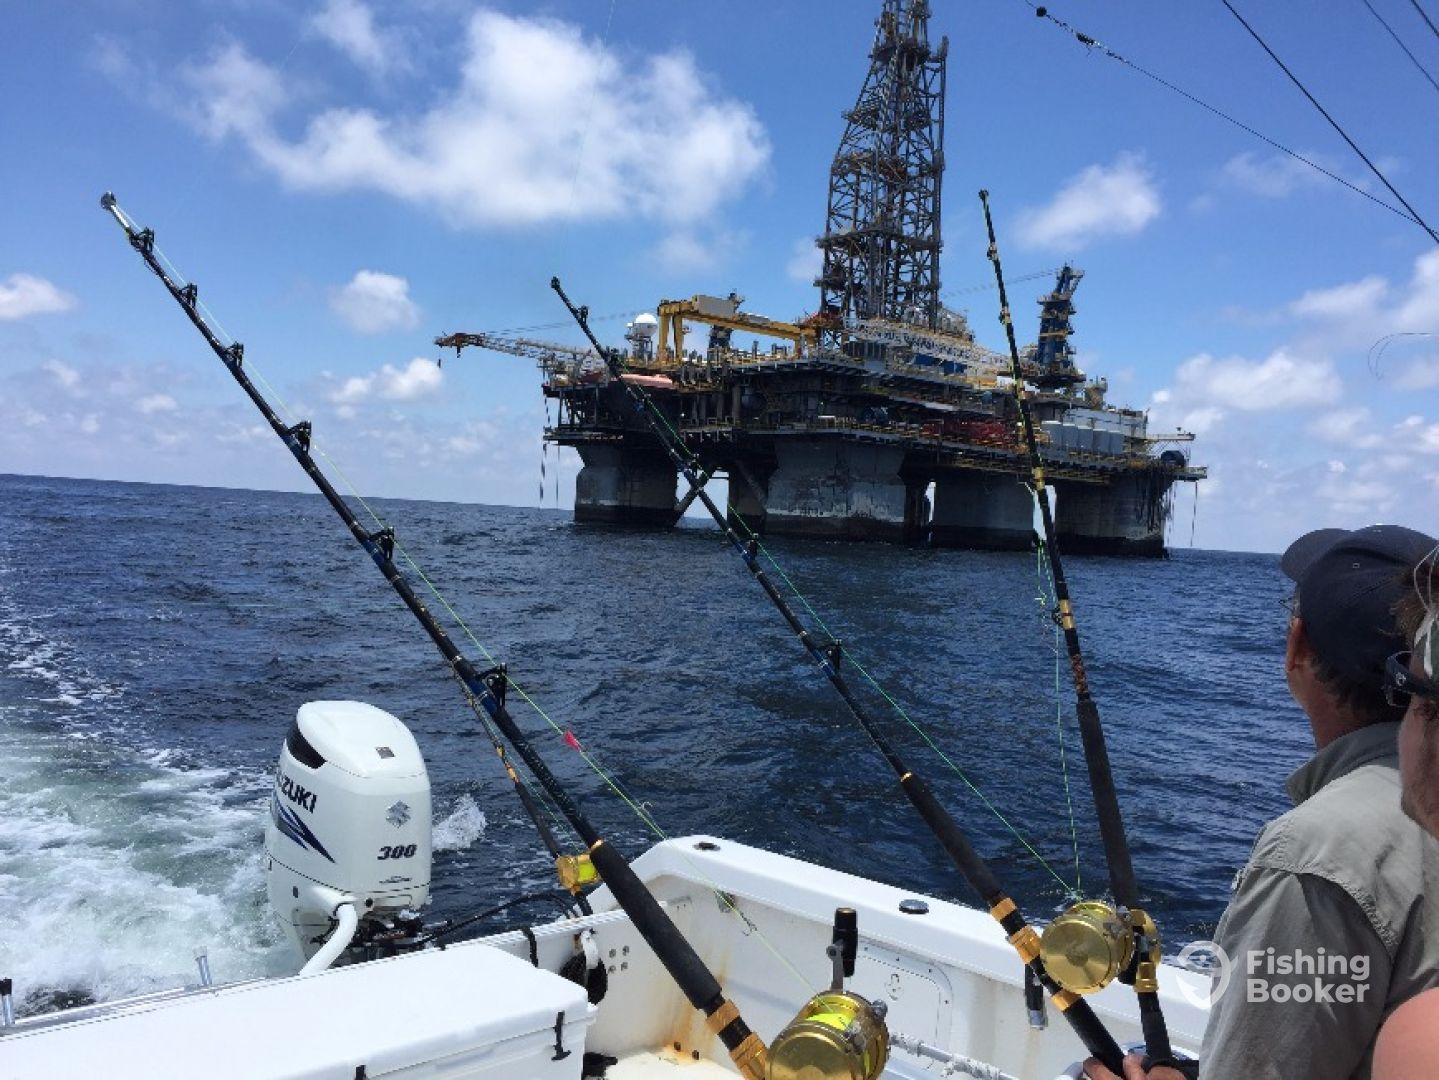 Coastal charters port aransas tx fishingbooker for Fishing charters port aransas